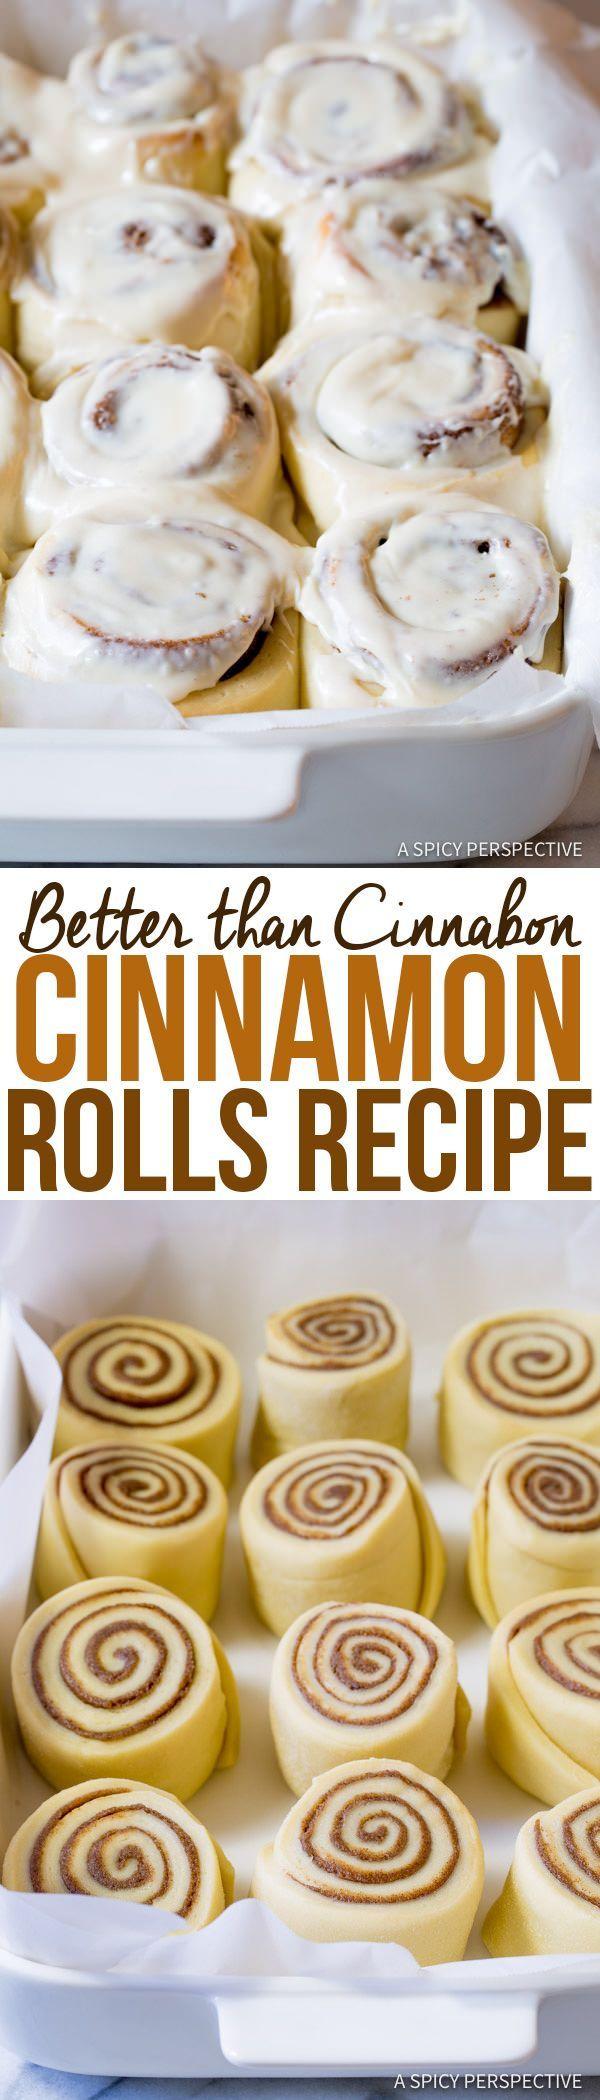 "Decadent ""Better than Cinnabon"" Cinnamon Rolls Recipe   ASpicyPerspective.com"